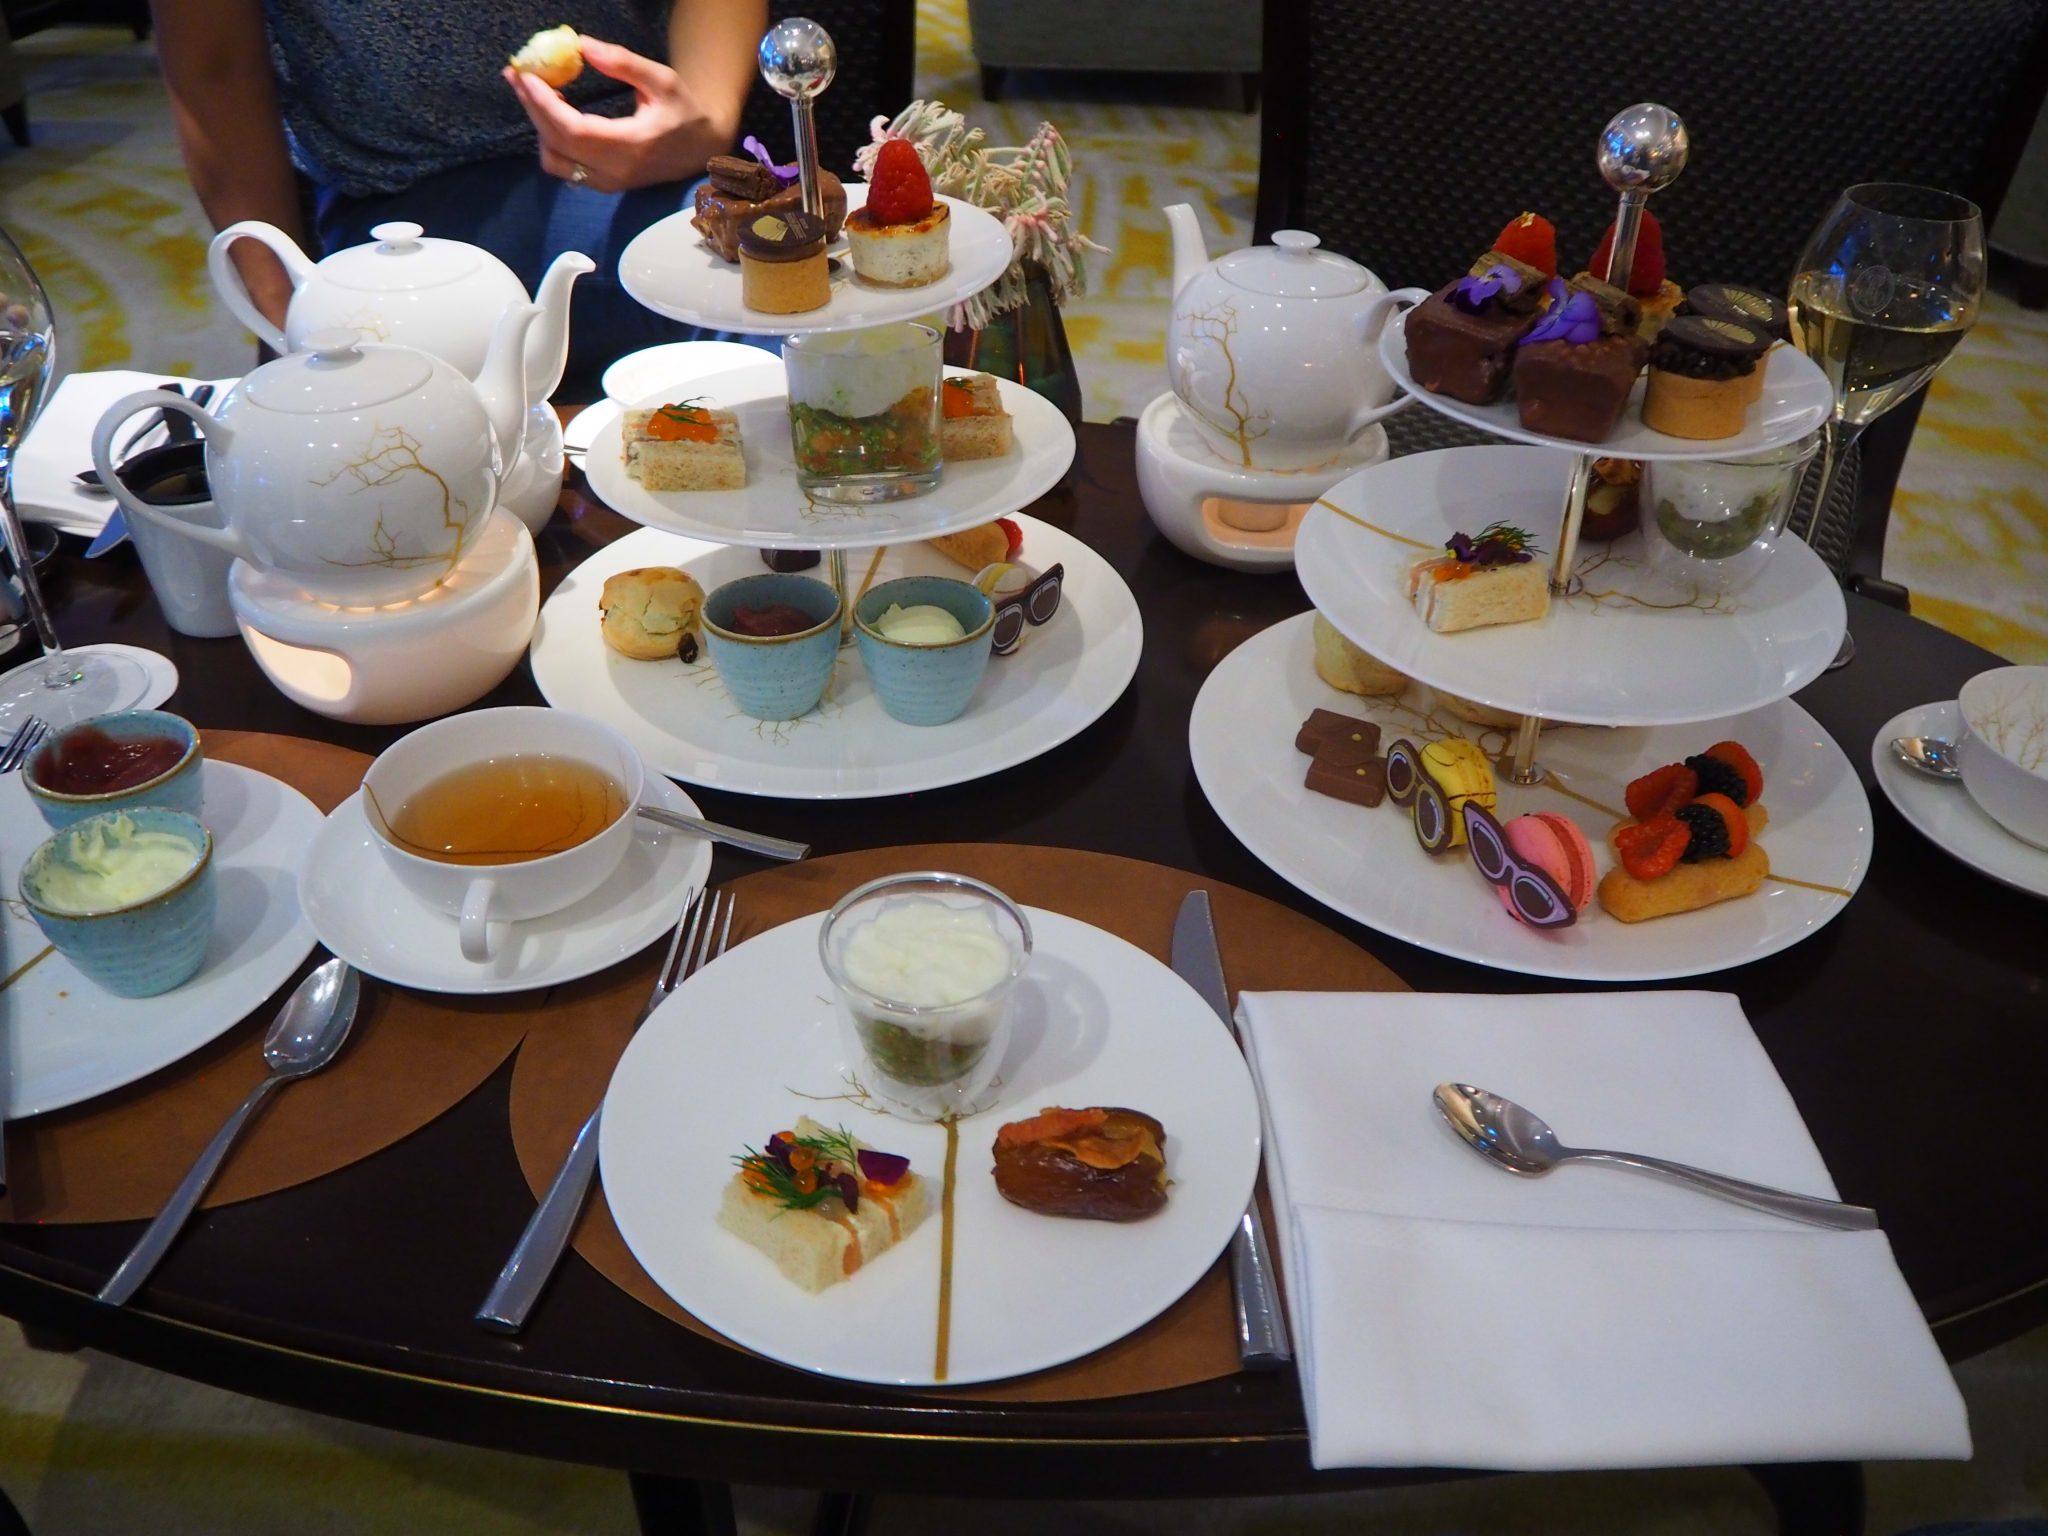 prix d'usine e3aa6 da81a Afternoon Tea at the Mandarin Oriental Munich – Review